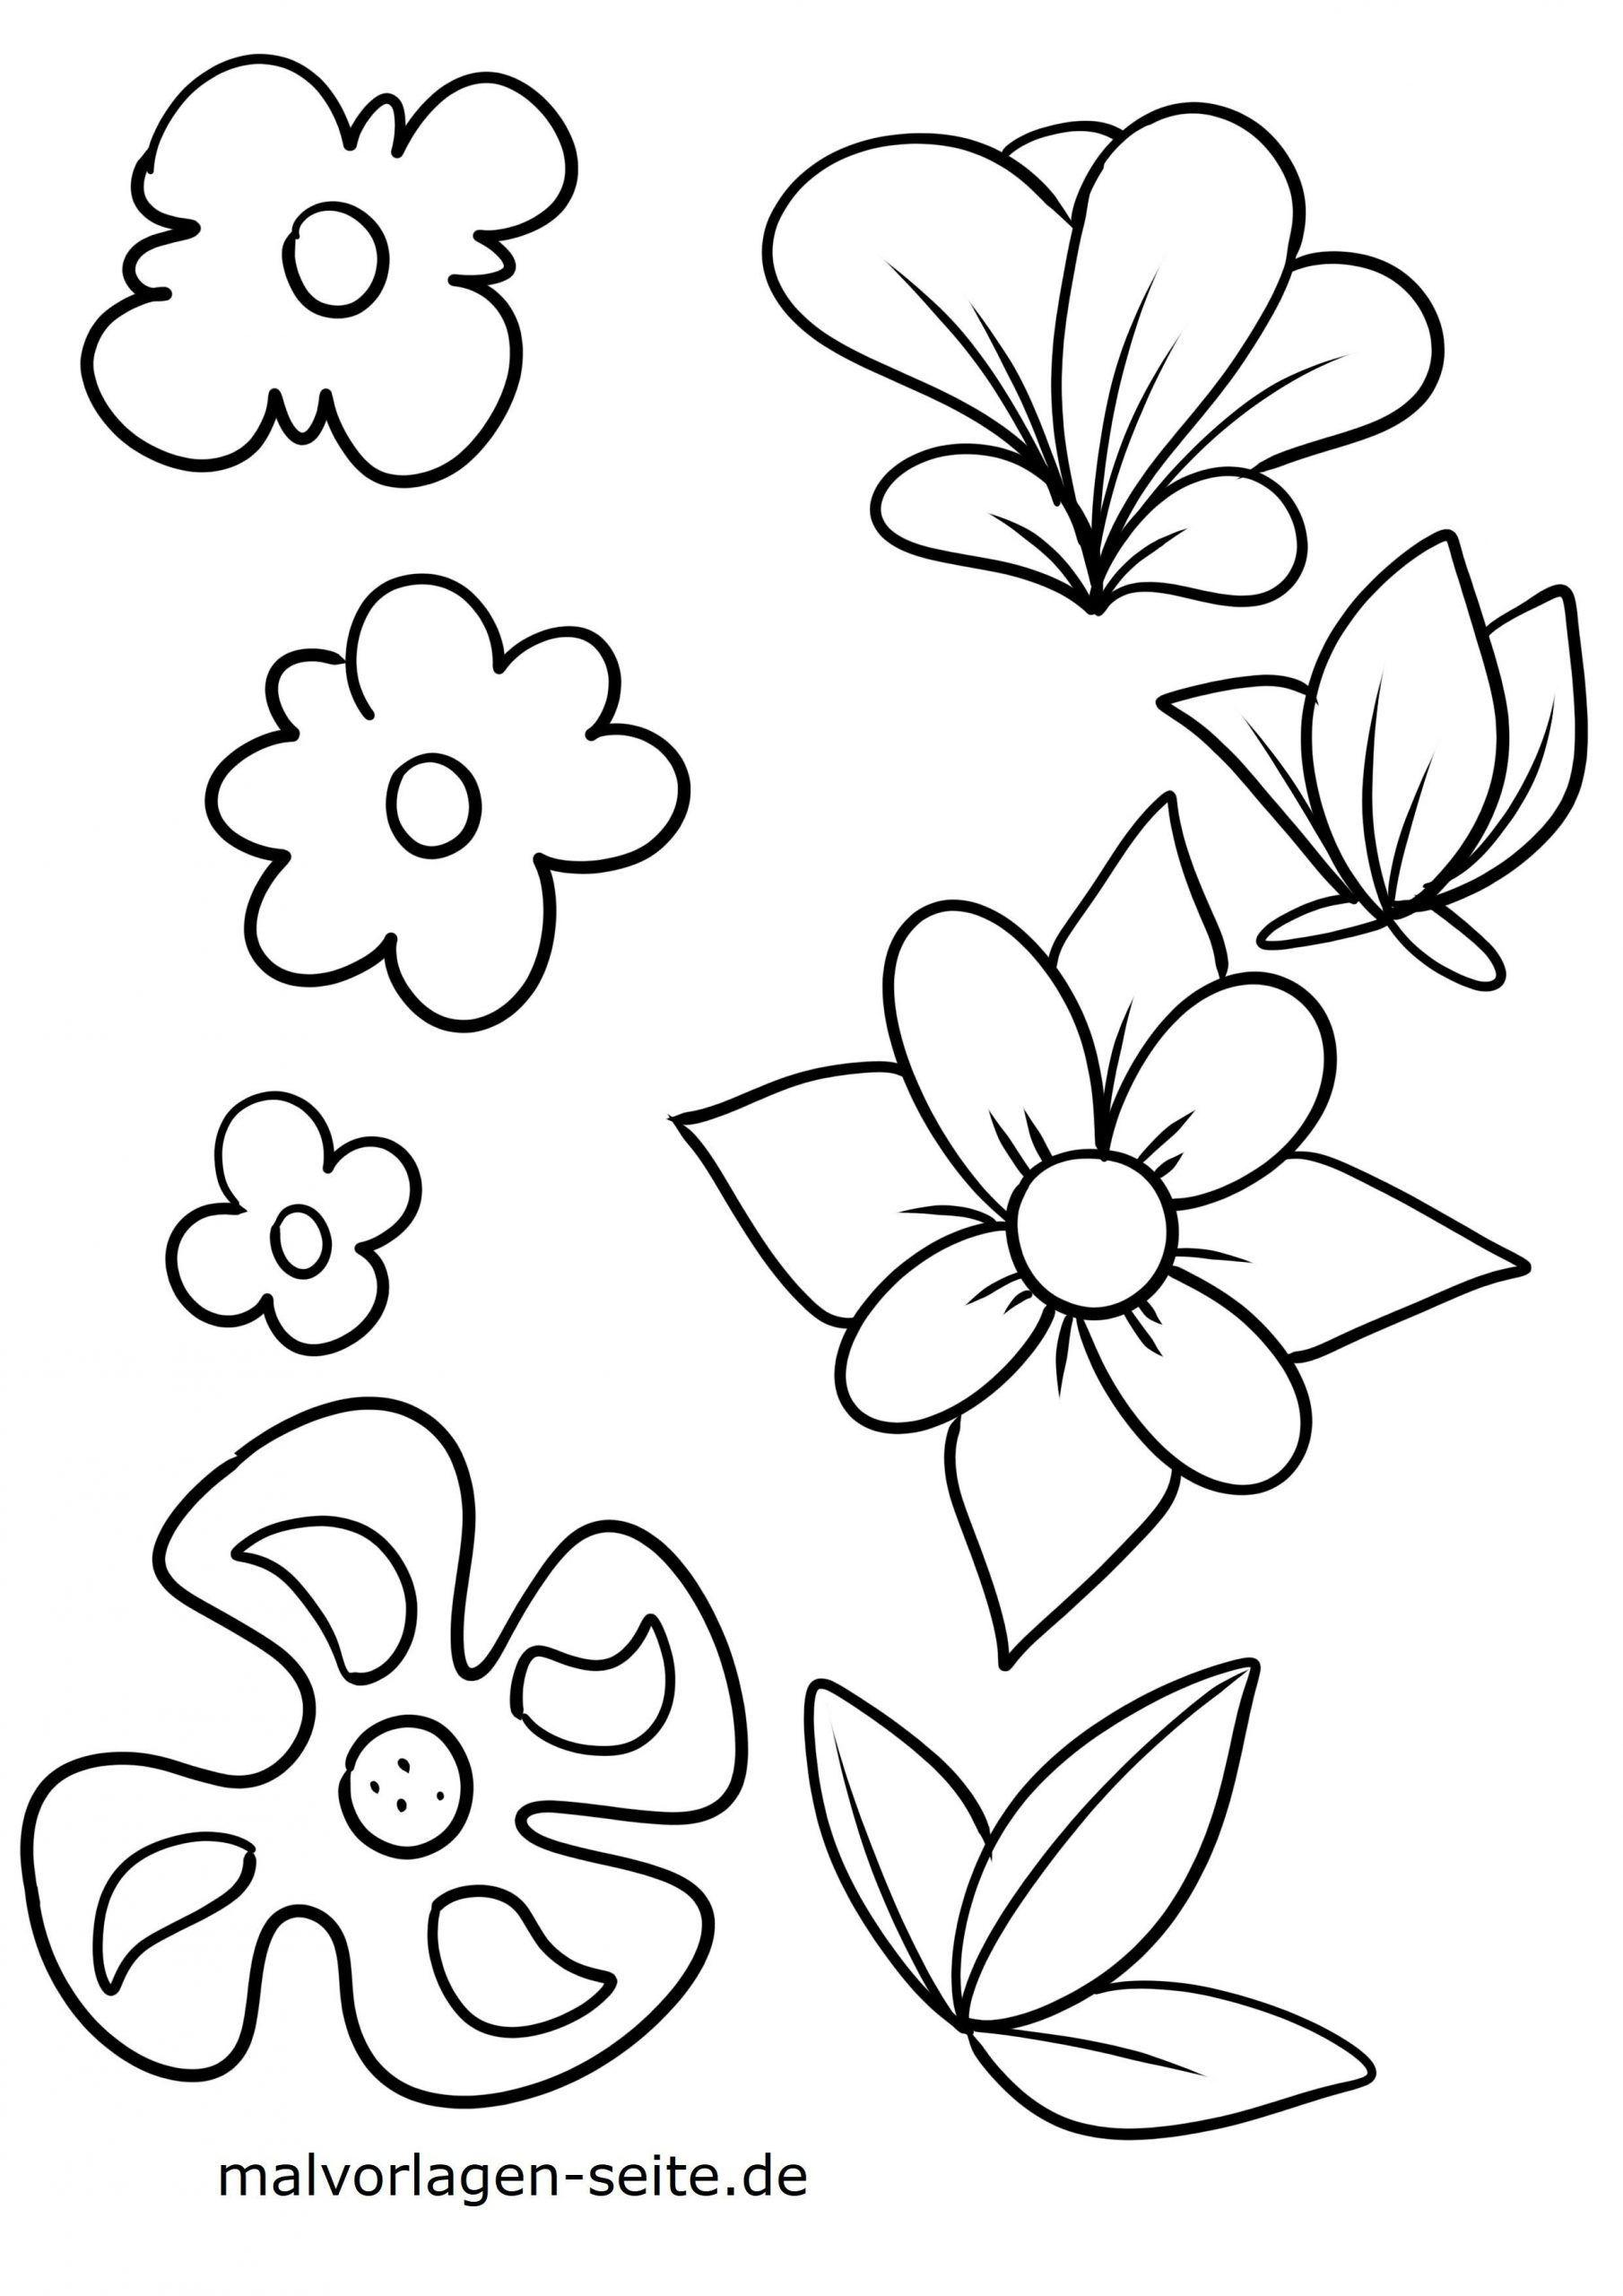 Neu Blumen Ausmalen Blumen Ausmalen Ausmalen Malvorlagen Blumen Ausmalen Malvorlagen Ausmalbilder